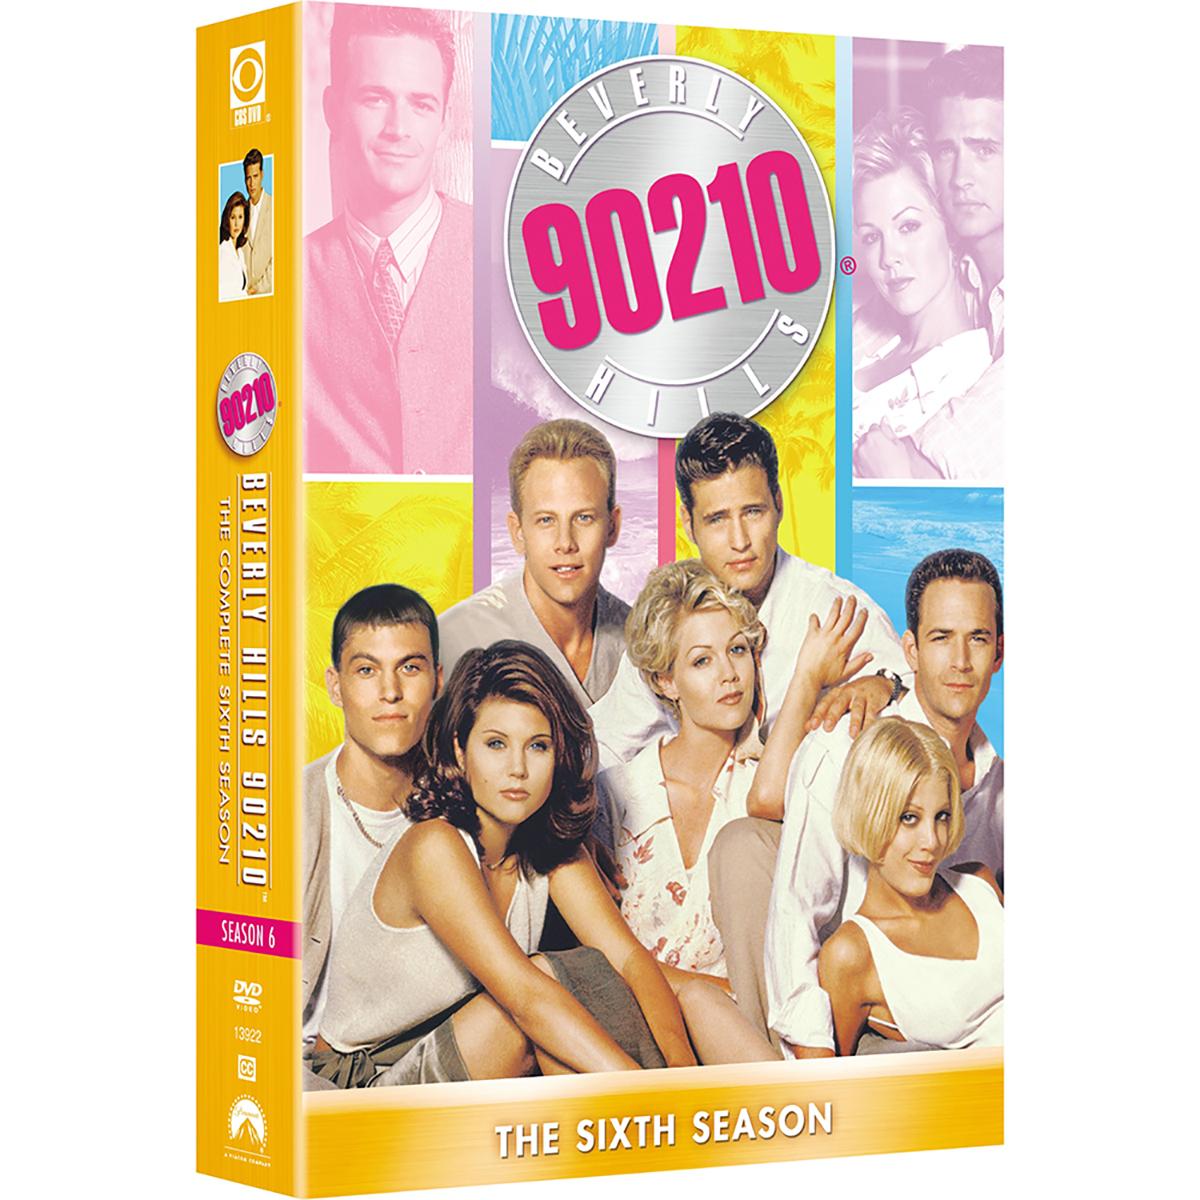 Beverly Hills 90210: Season 6 DVD